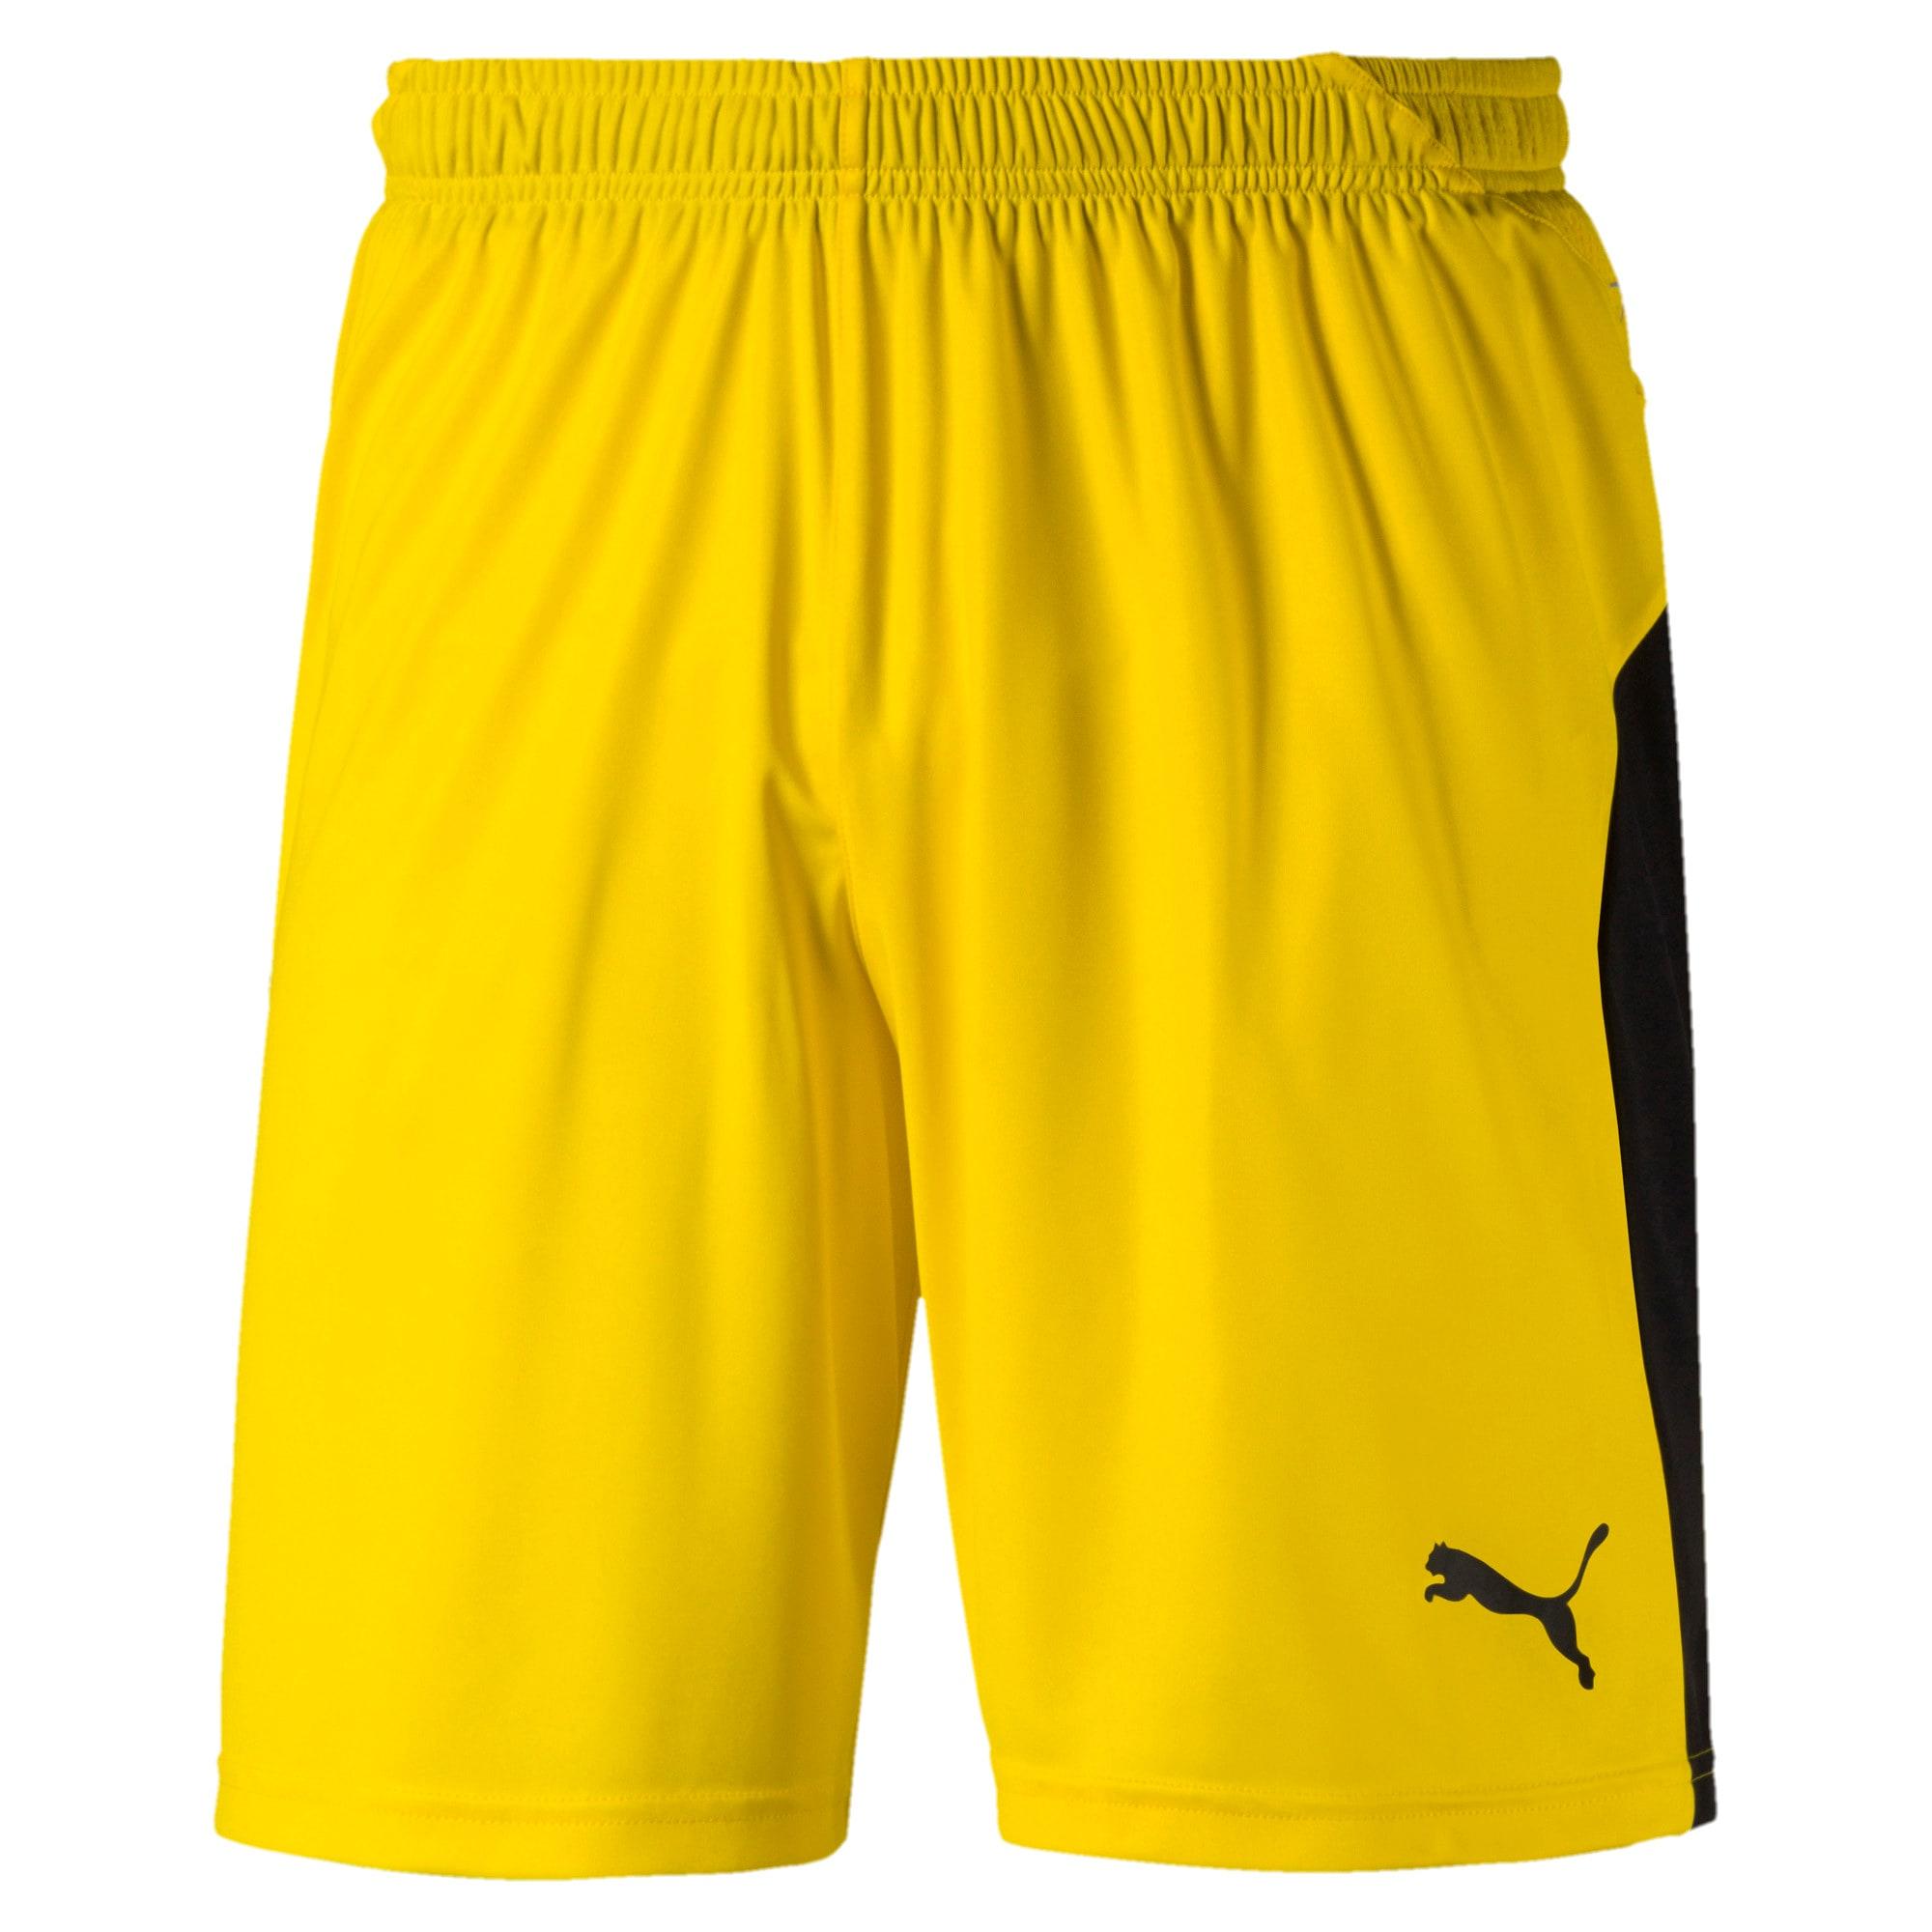 Thumbnail 1 of Liga Men's Shorts, Cyber Yellow-Puma Black, medium